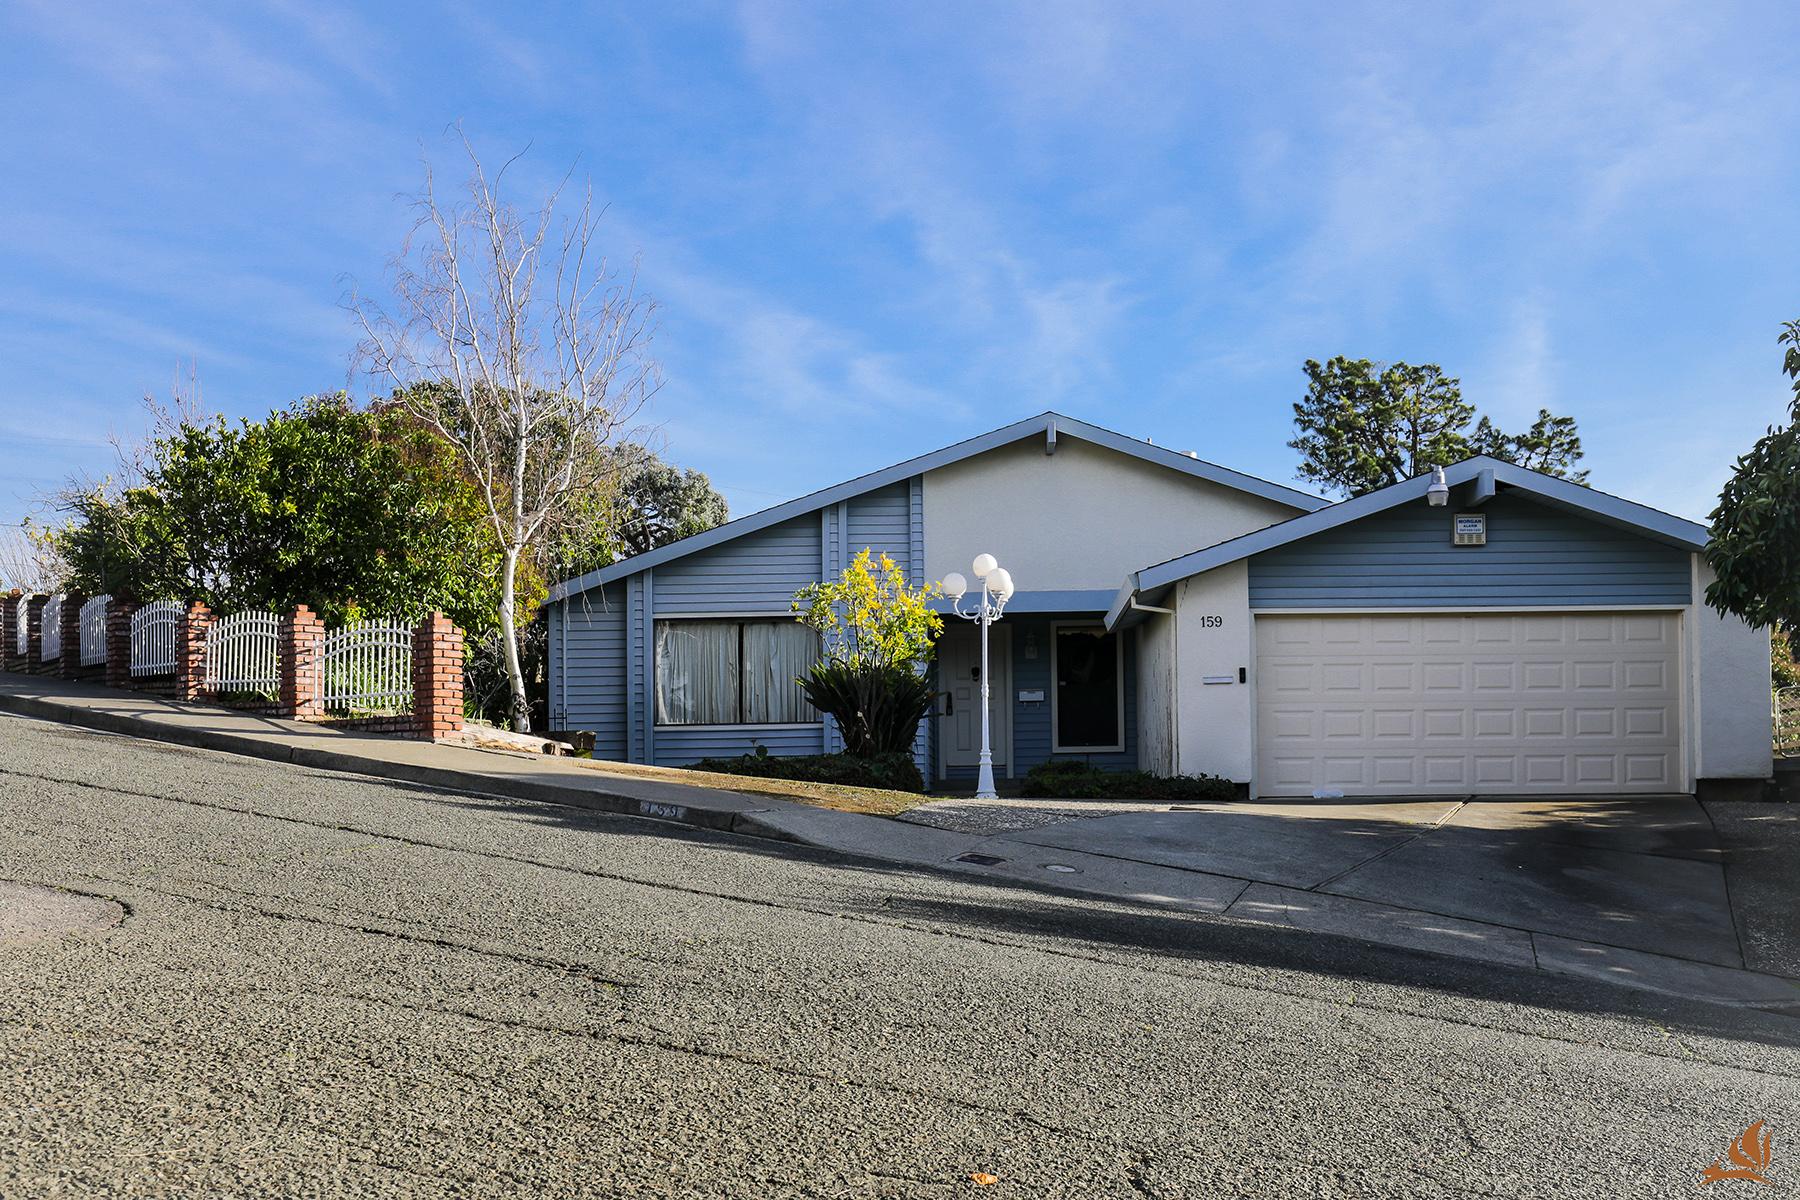 独户住宅 为 销售 在 159 Farallon Dr, Vallejo, CA 94590 159 Farallon Dr Vallejo, 加利福尼亚州 94590 美国